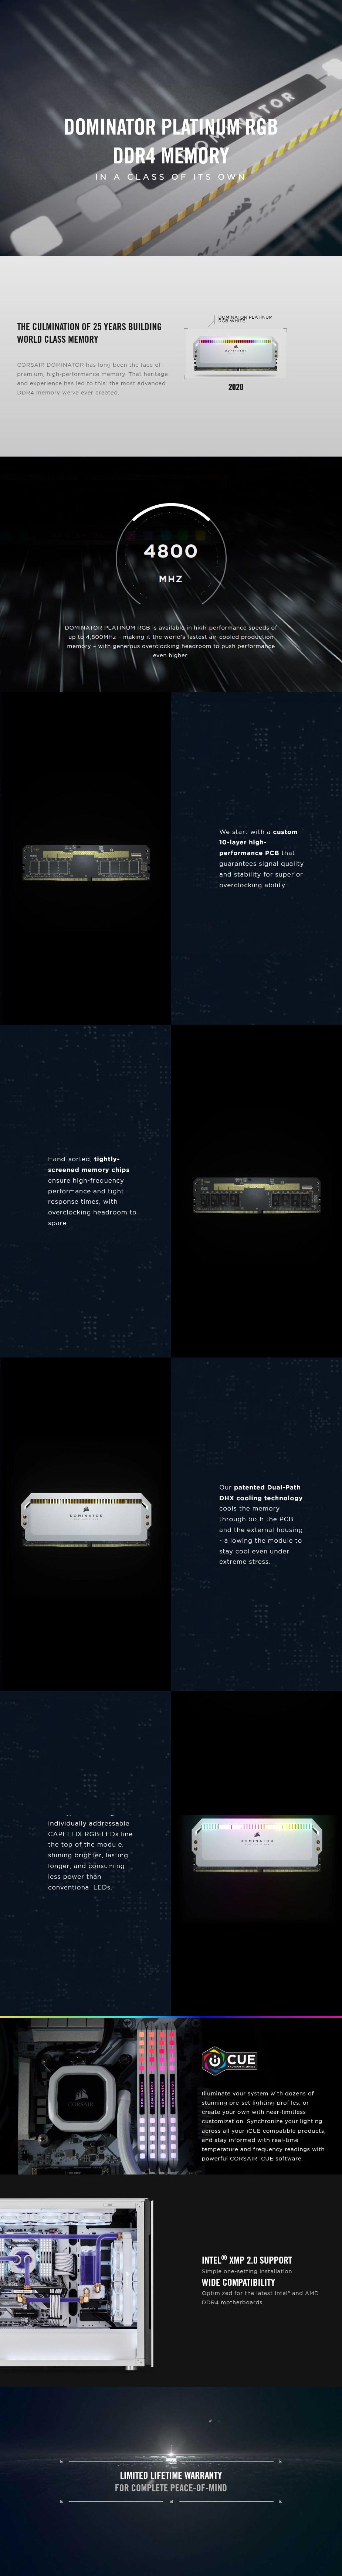 corsair-dominator-platinum-rgb-16gb-2x-8gb-ddr4-3200mhz-memory-white-ac35632-2-4-.jpg